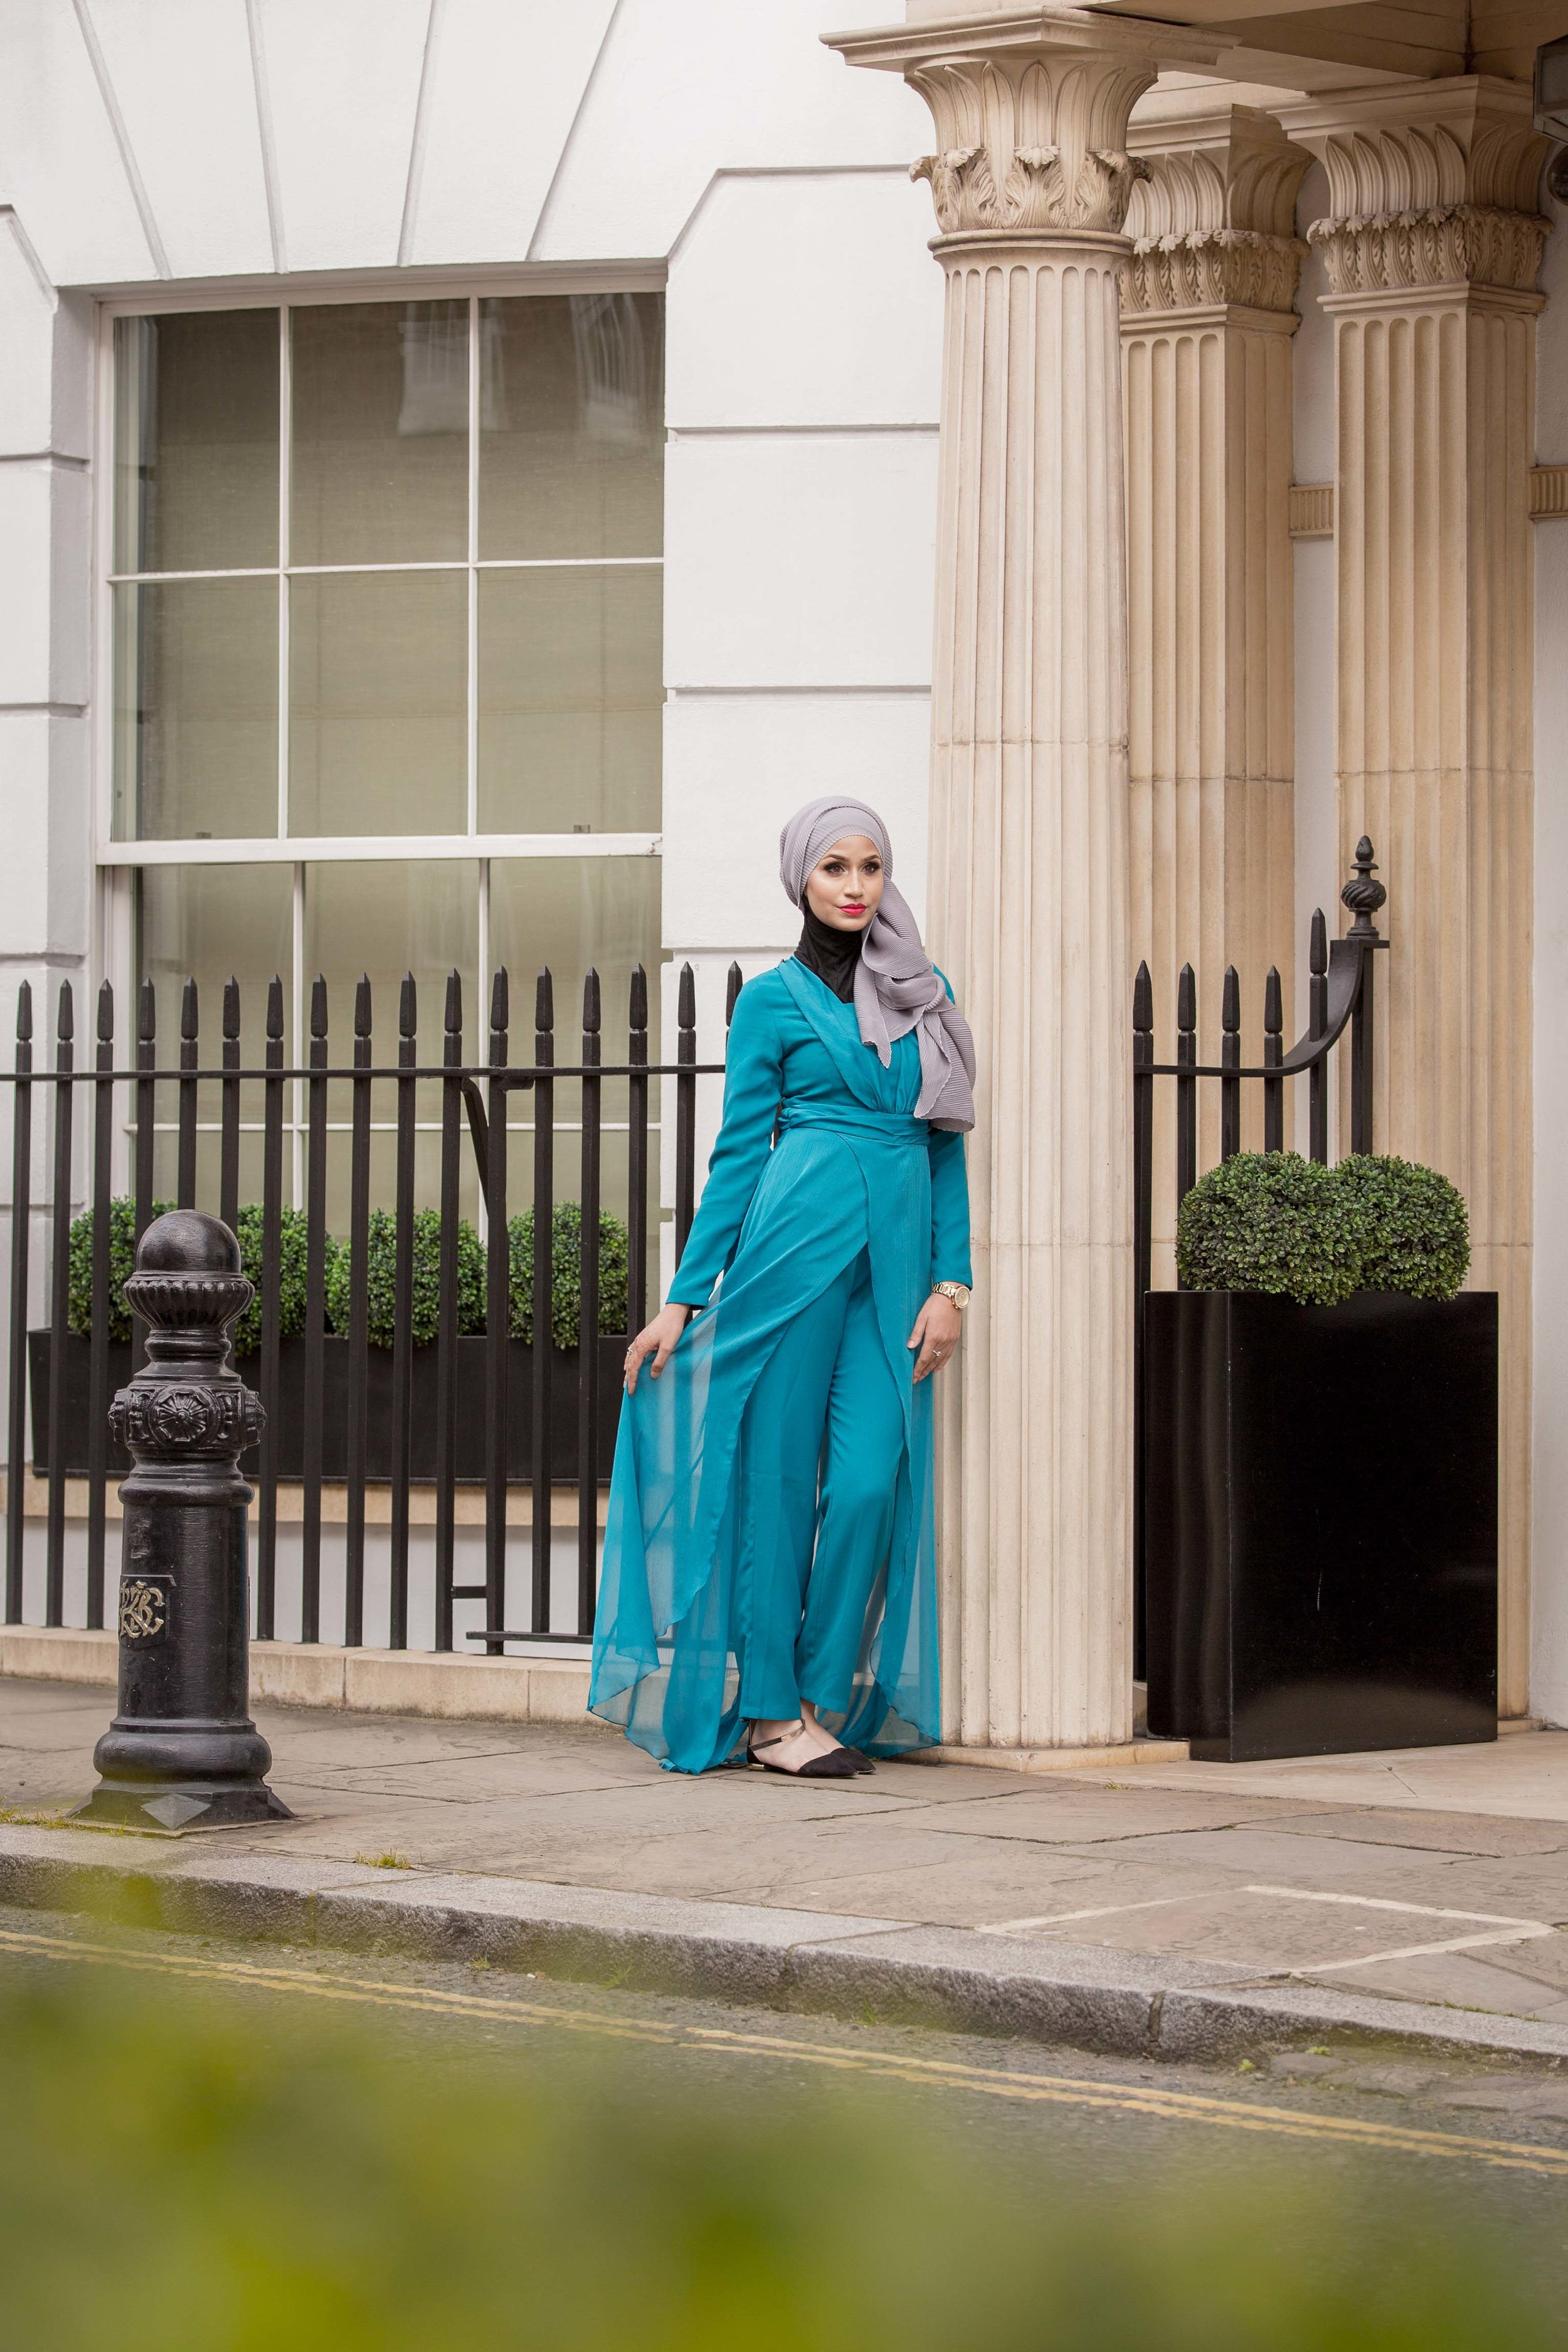 heute-elan-modest-street-aisha-rahman-fashion-photography-london-bristol-natalia-smith-photography-32.jpg